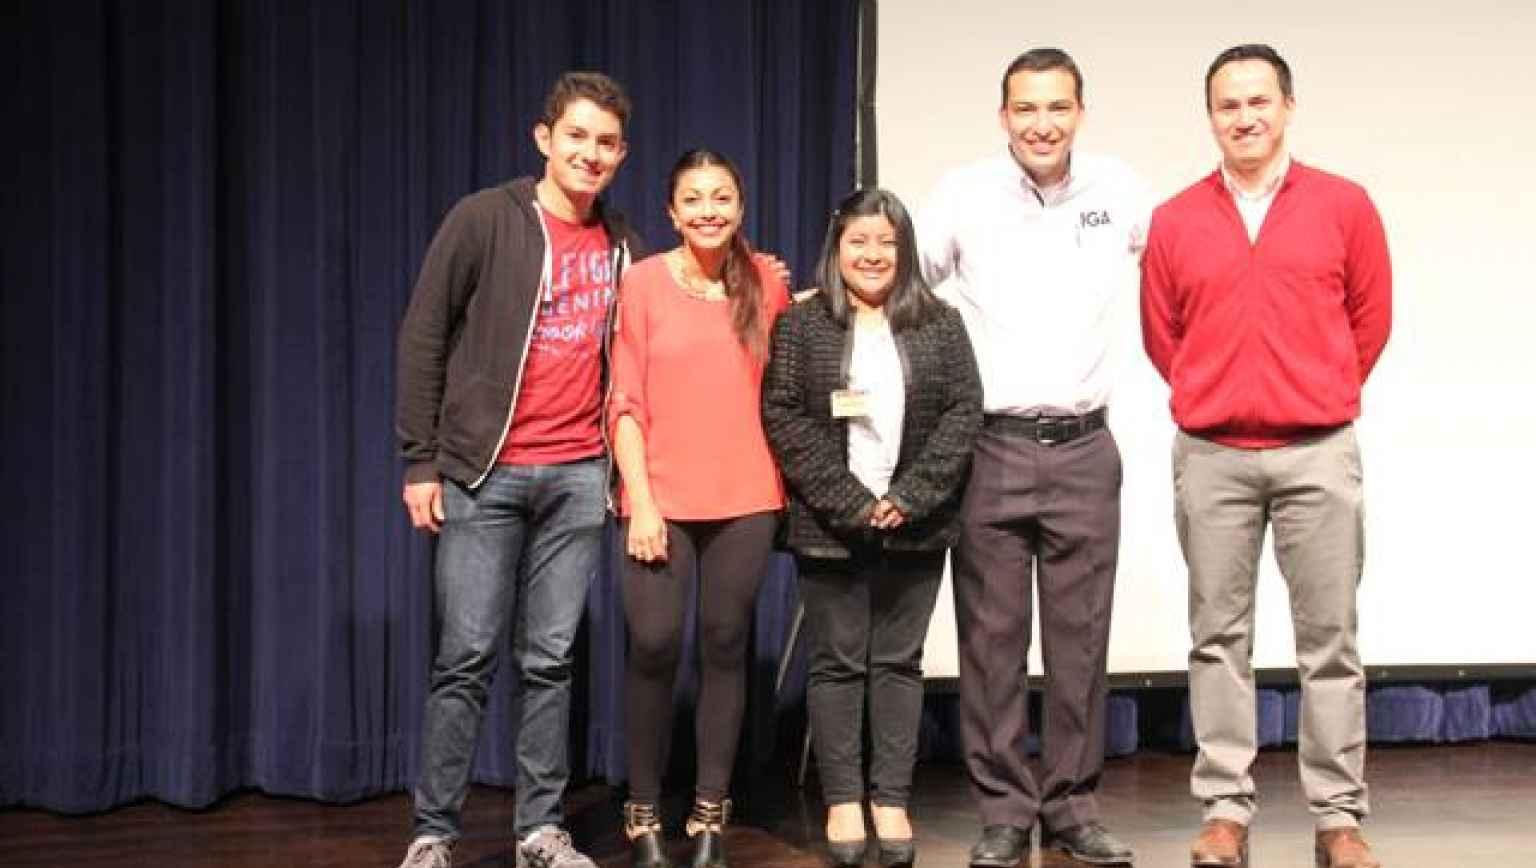 Guatemala City and Xela EducationUSA Advisers with international students